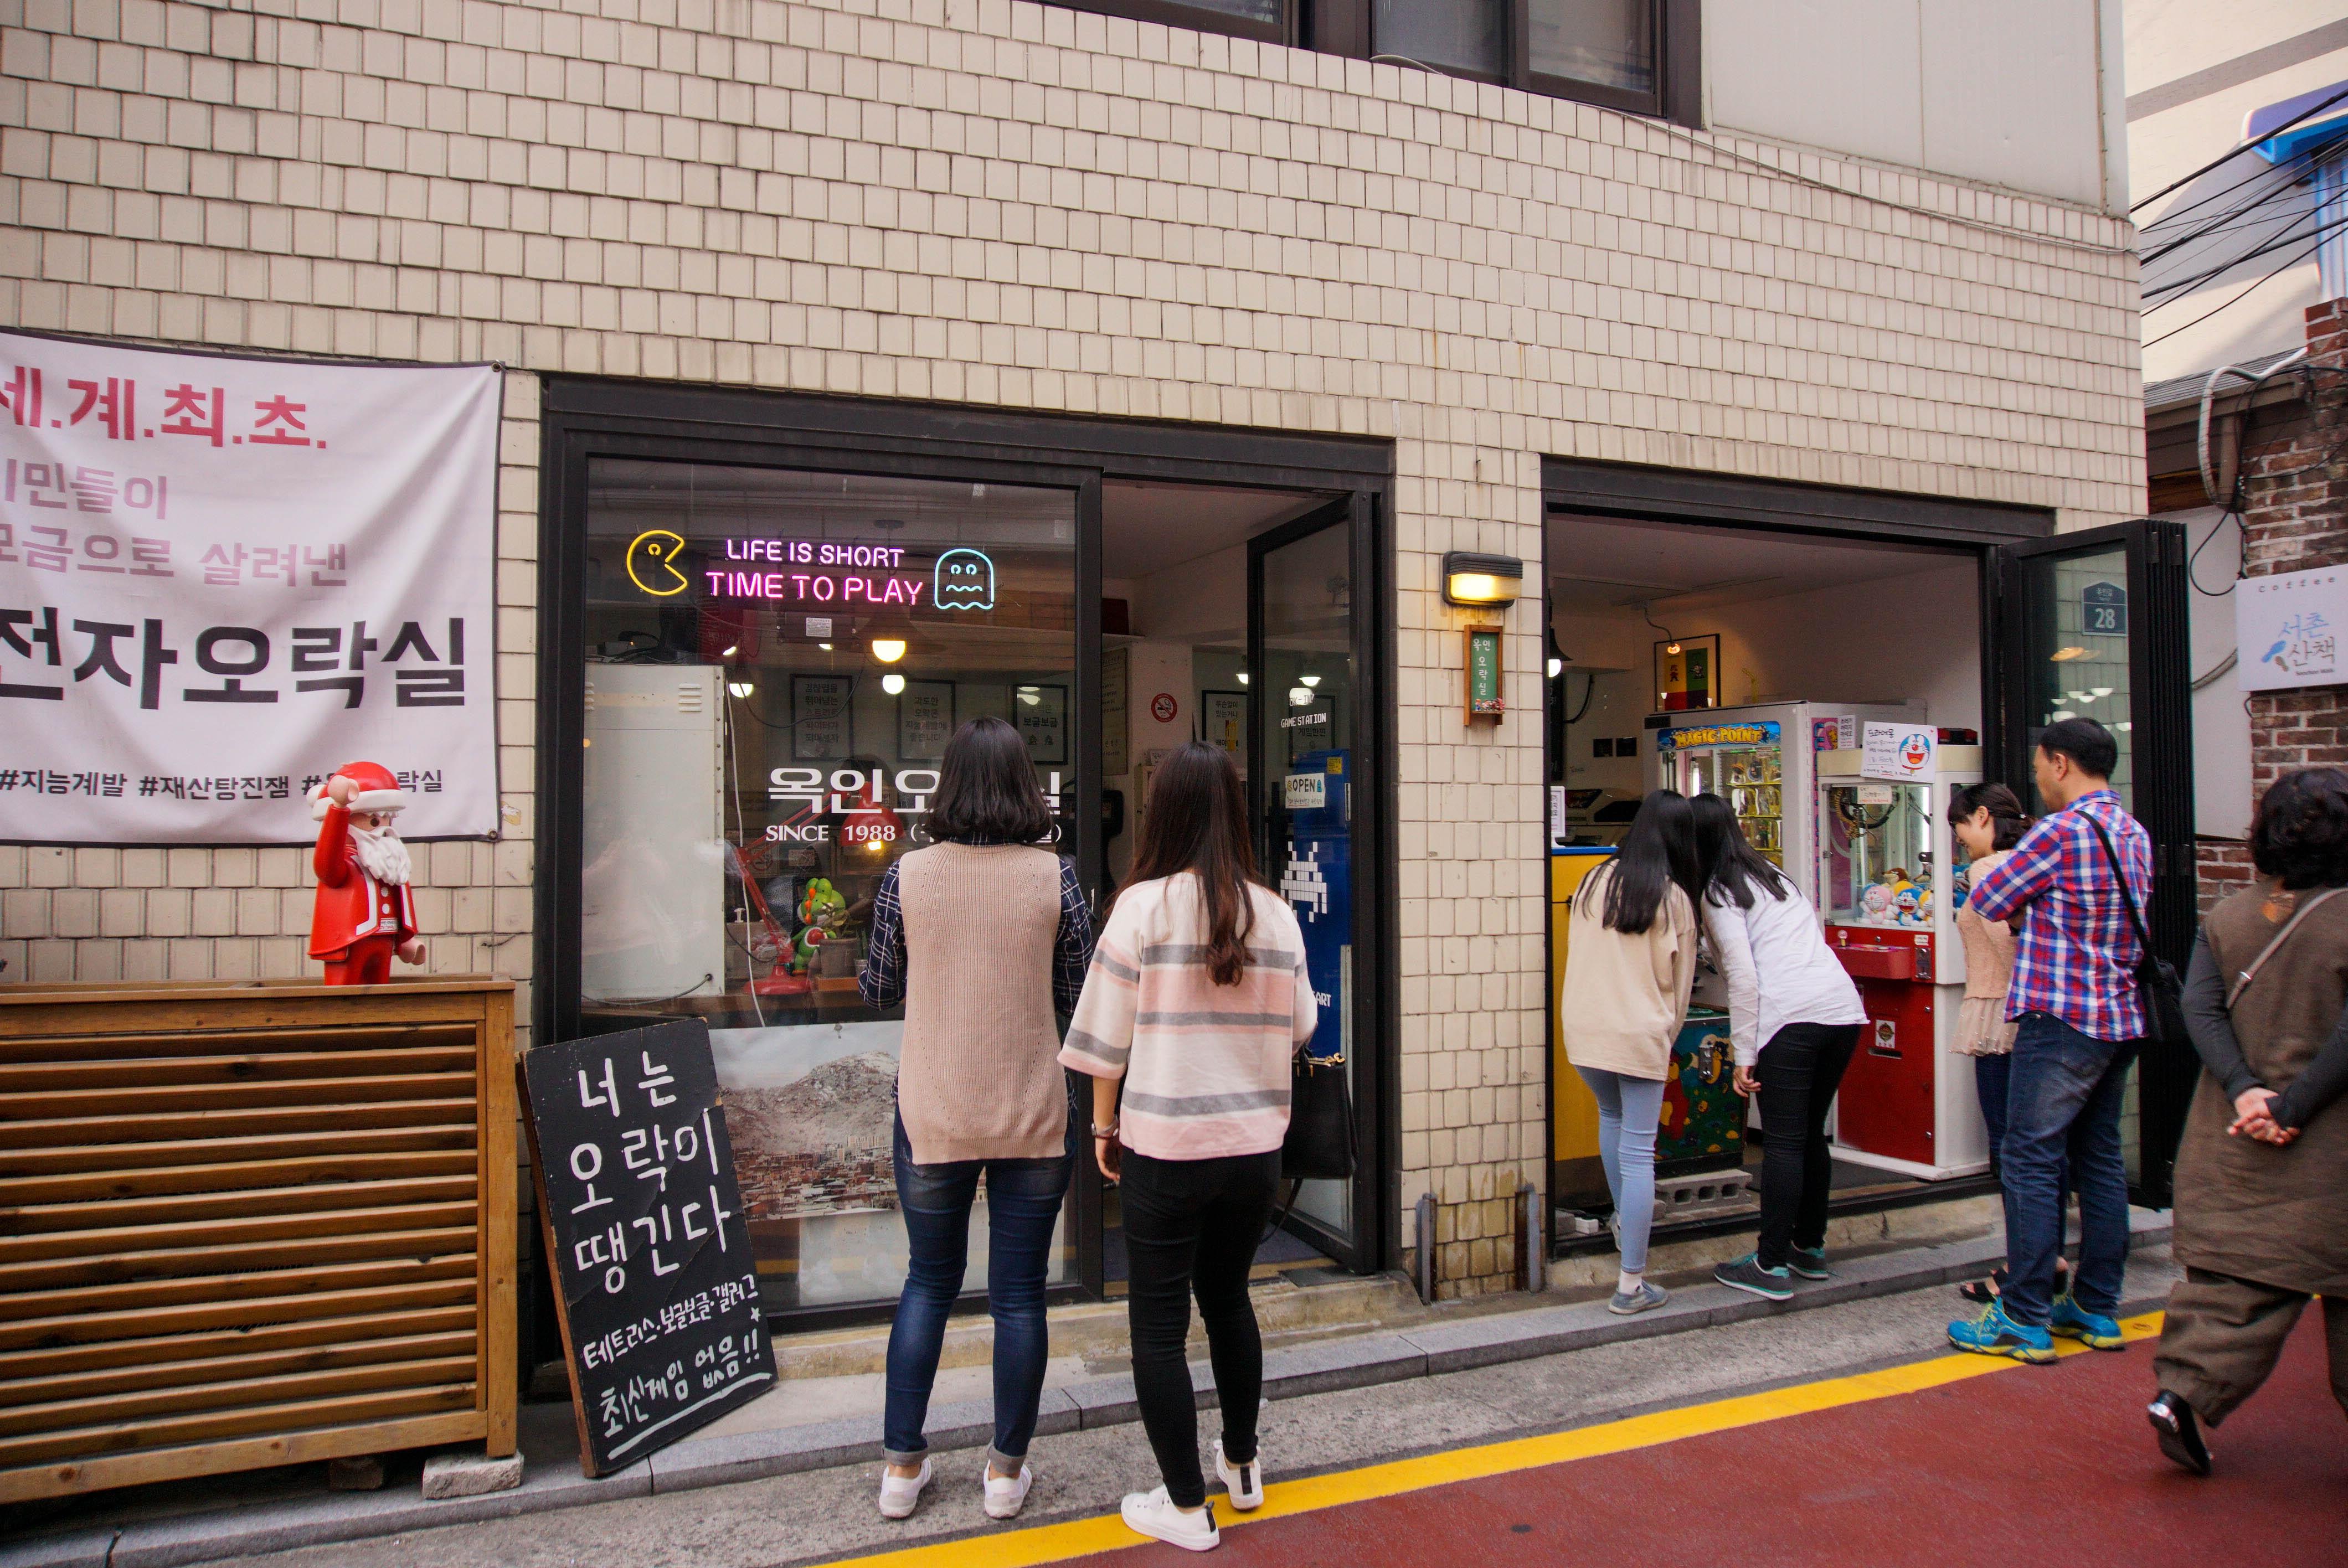 socheonwalk-8